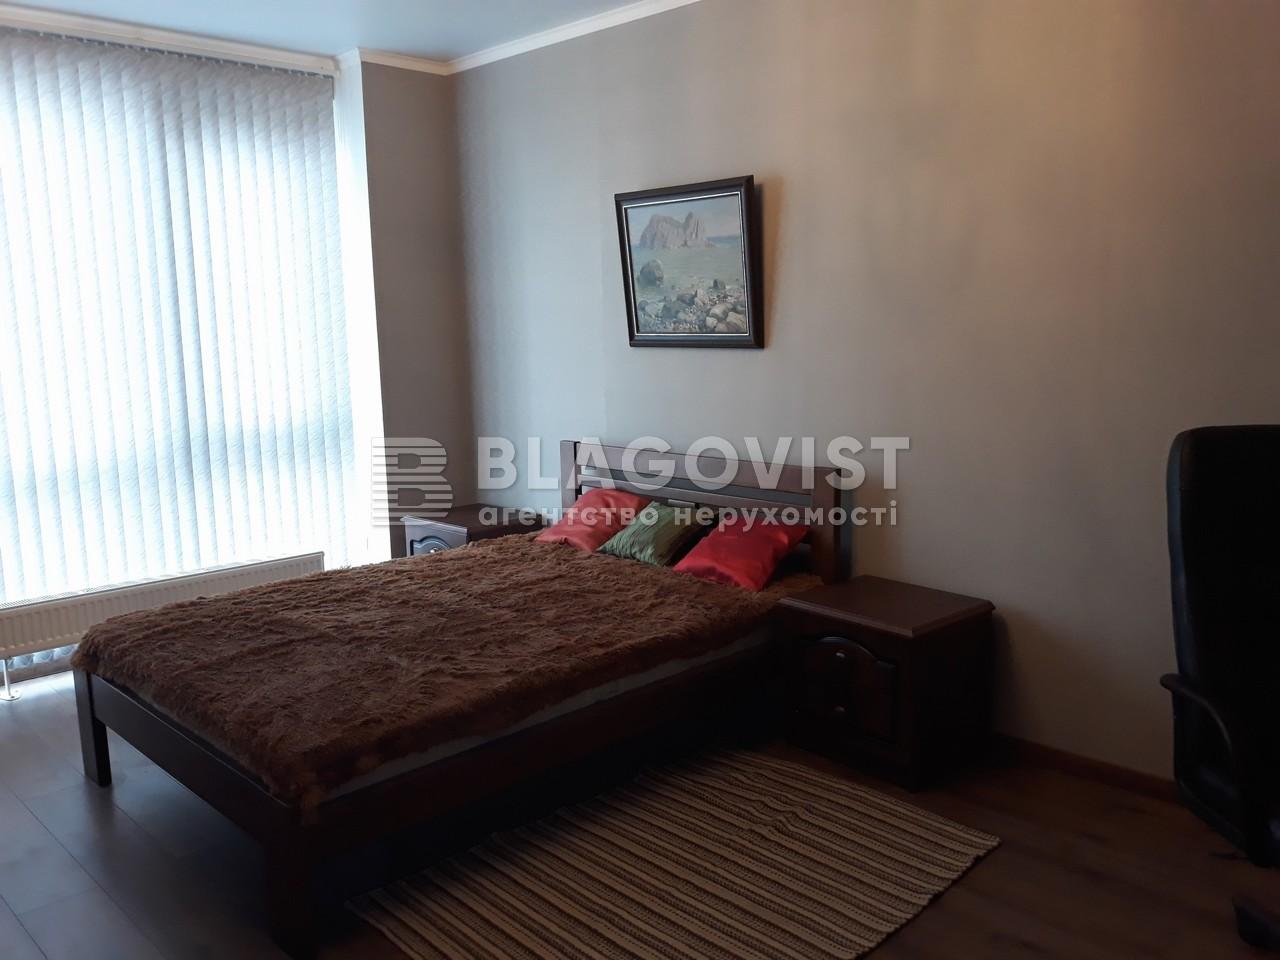 Квартира H-43926, Жмаченко Генерала, 28, Киев - Фото 5